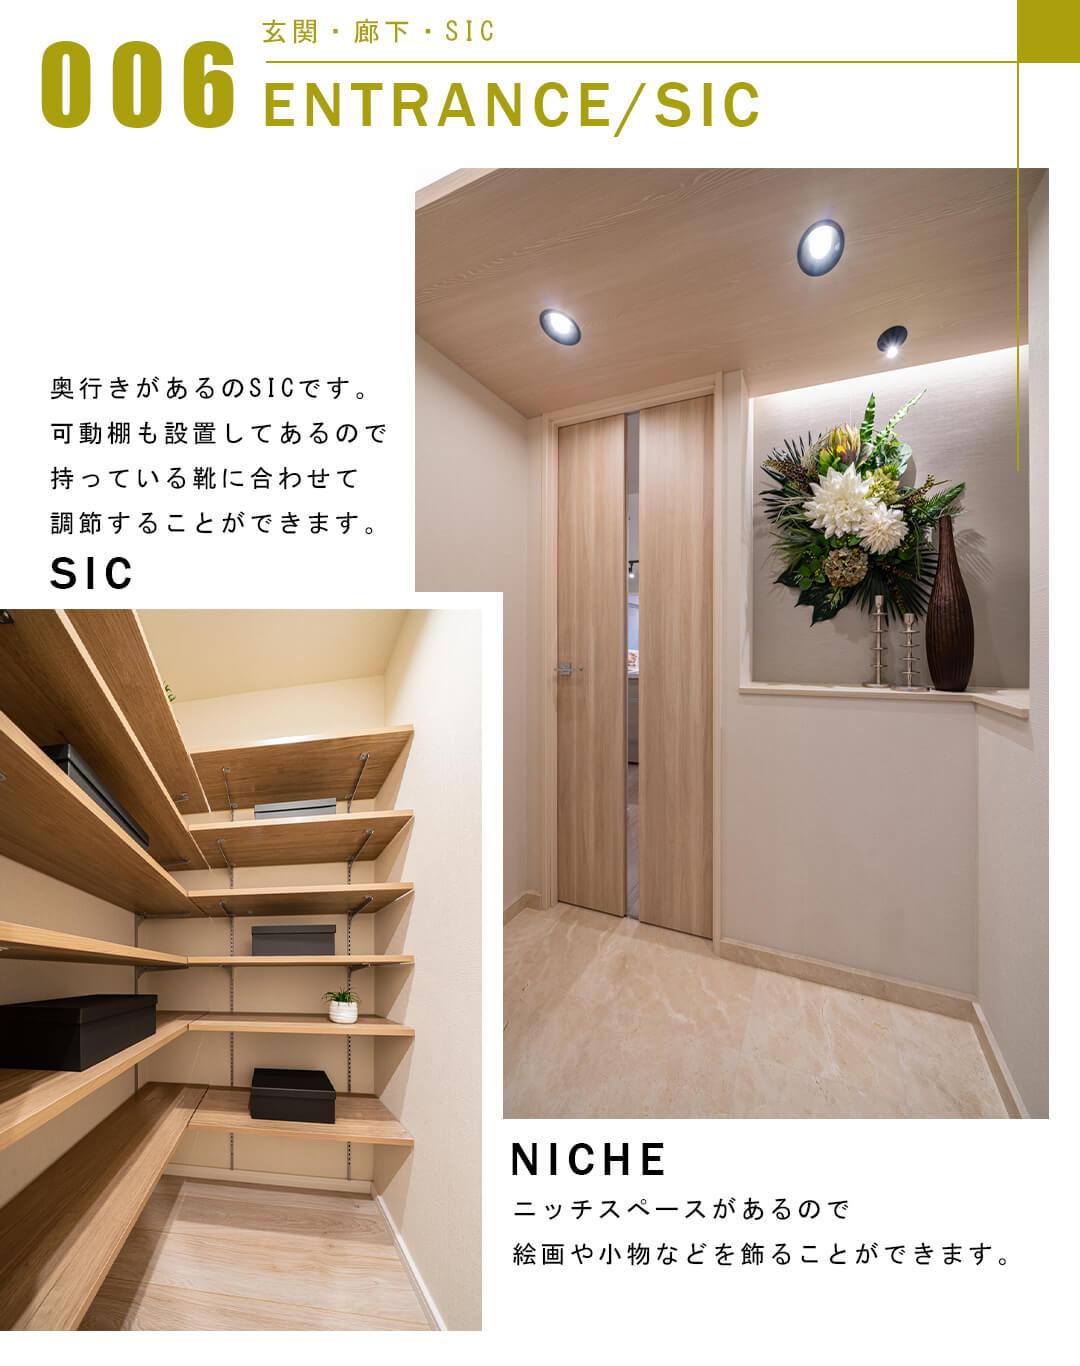 006玄関,廊下,SIC,ENTRANCE